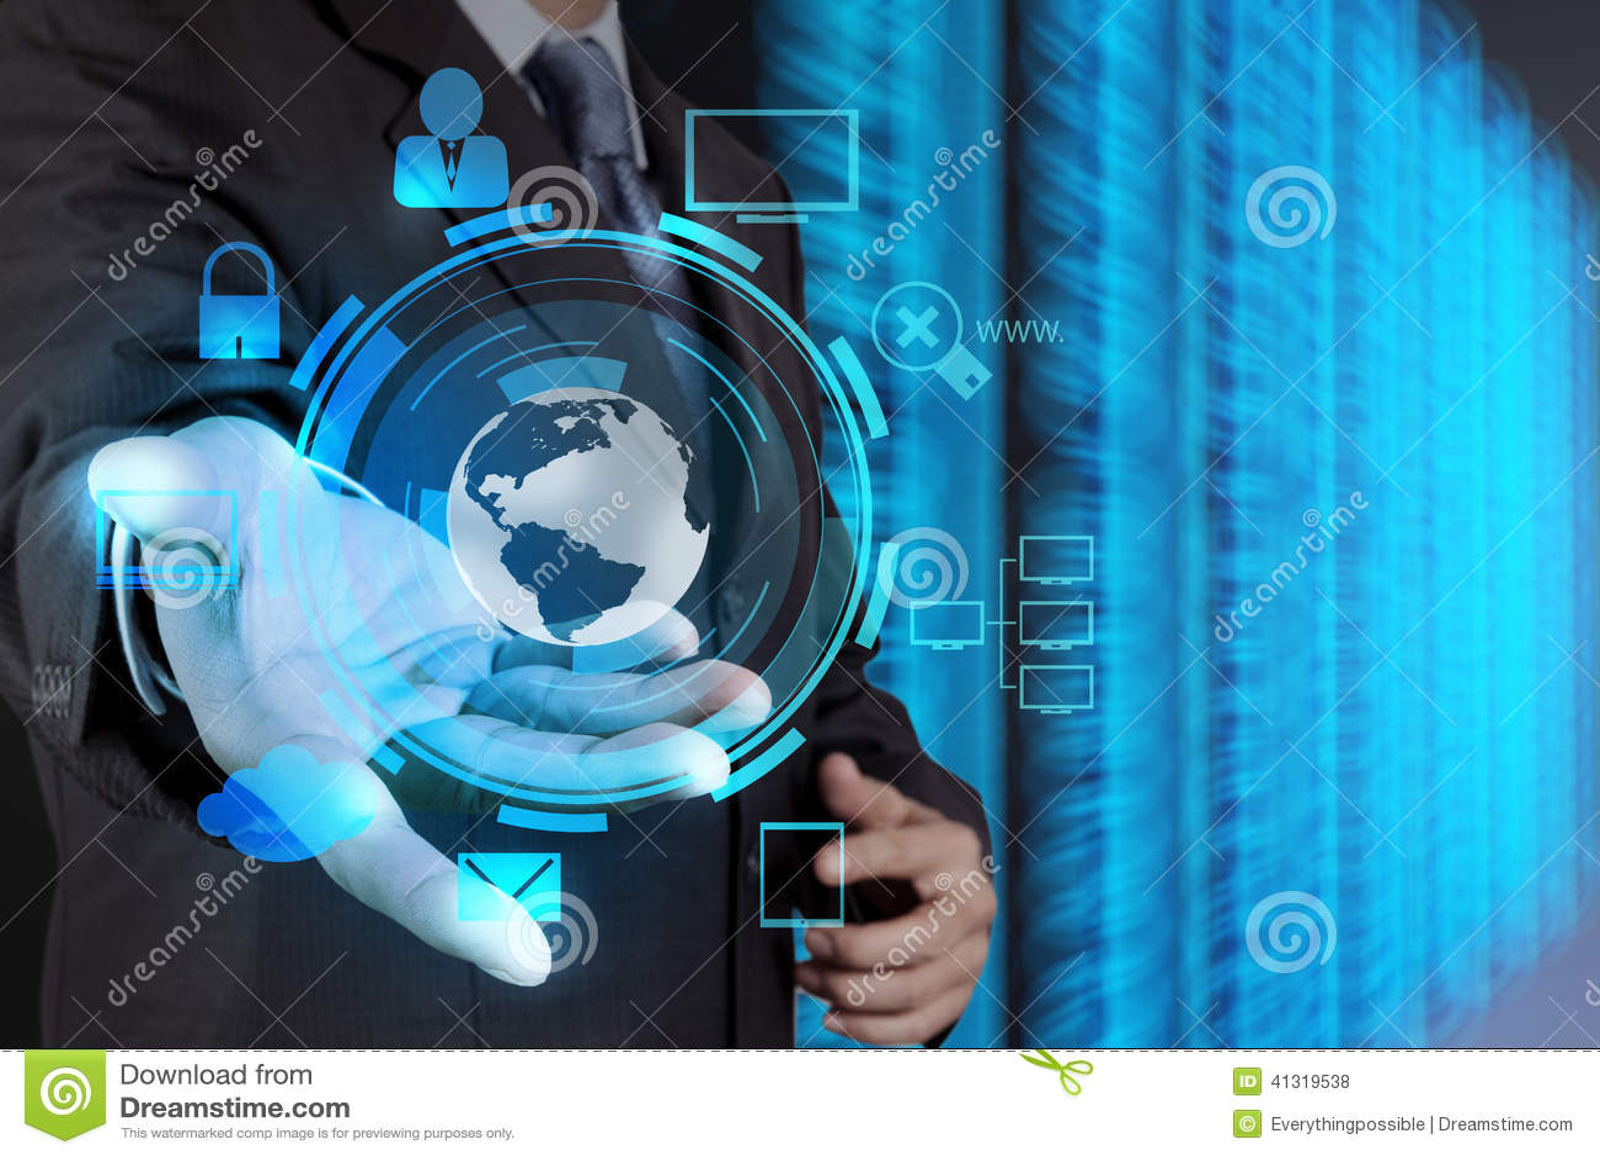 Technology Management Image: Businessman Hand Holding Cloud Network Icon Stock Photo